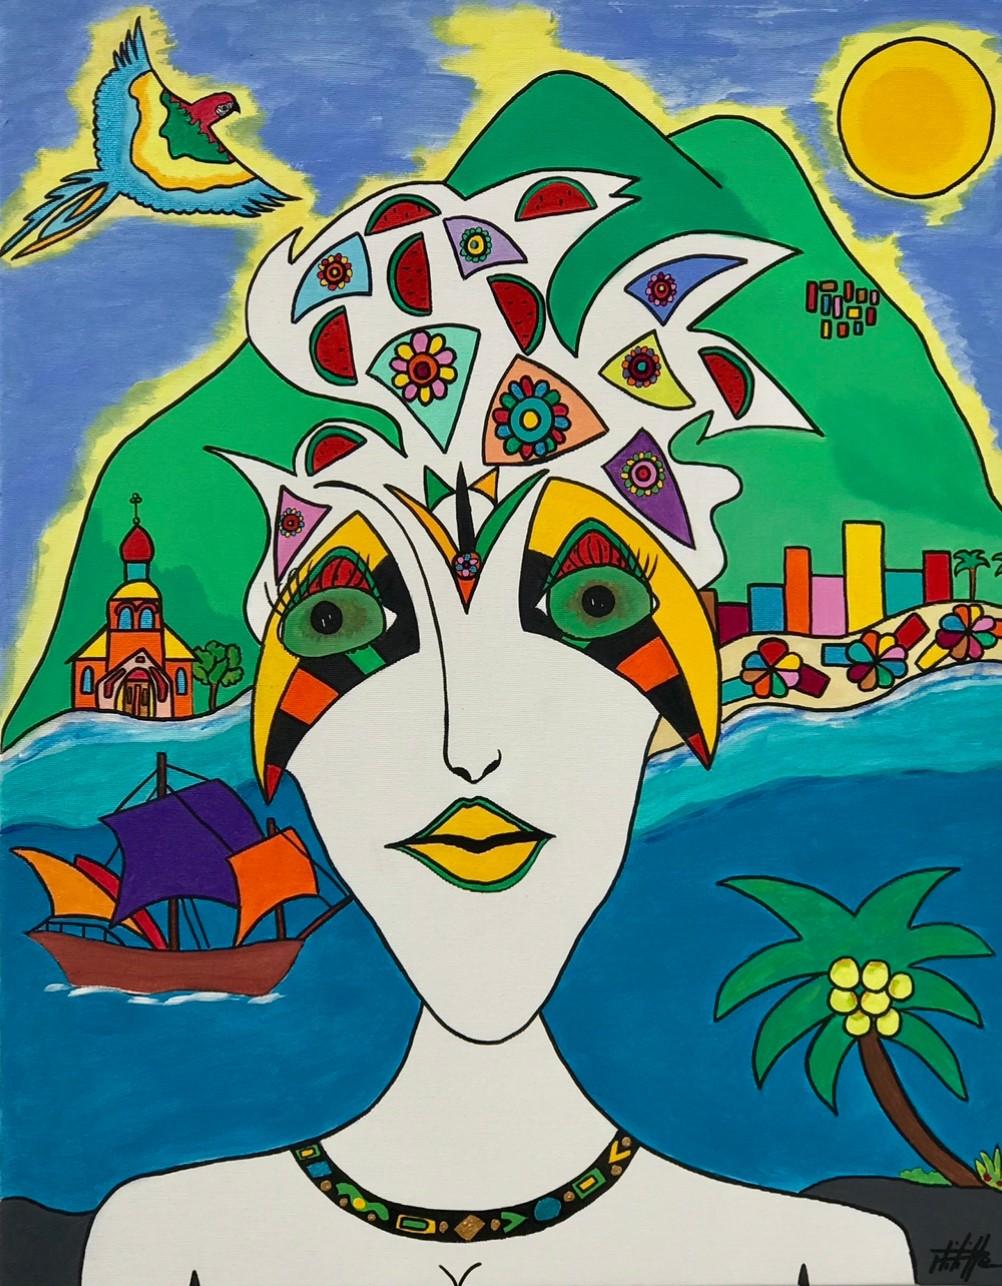 Philippe Seigle - A garota do sol